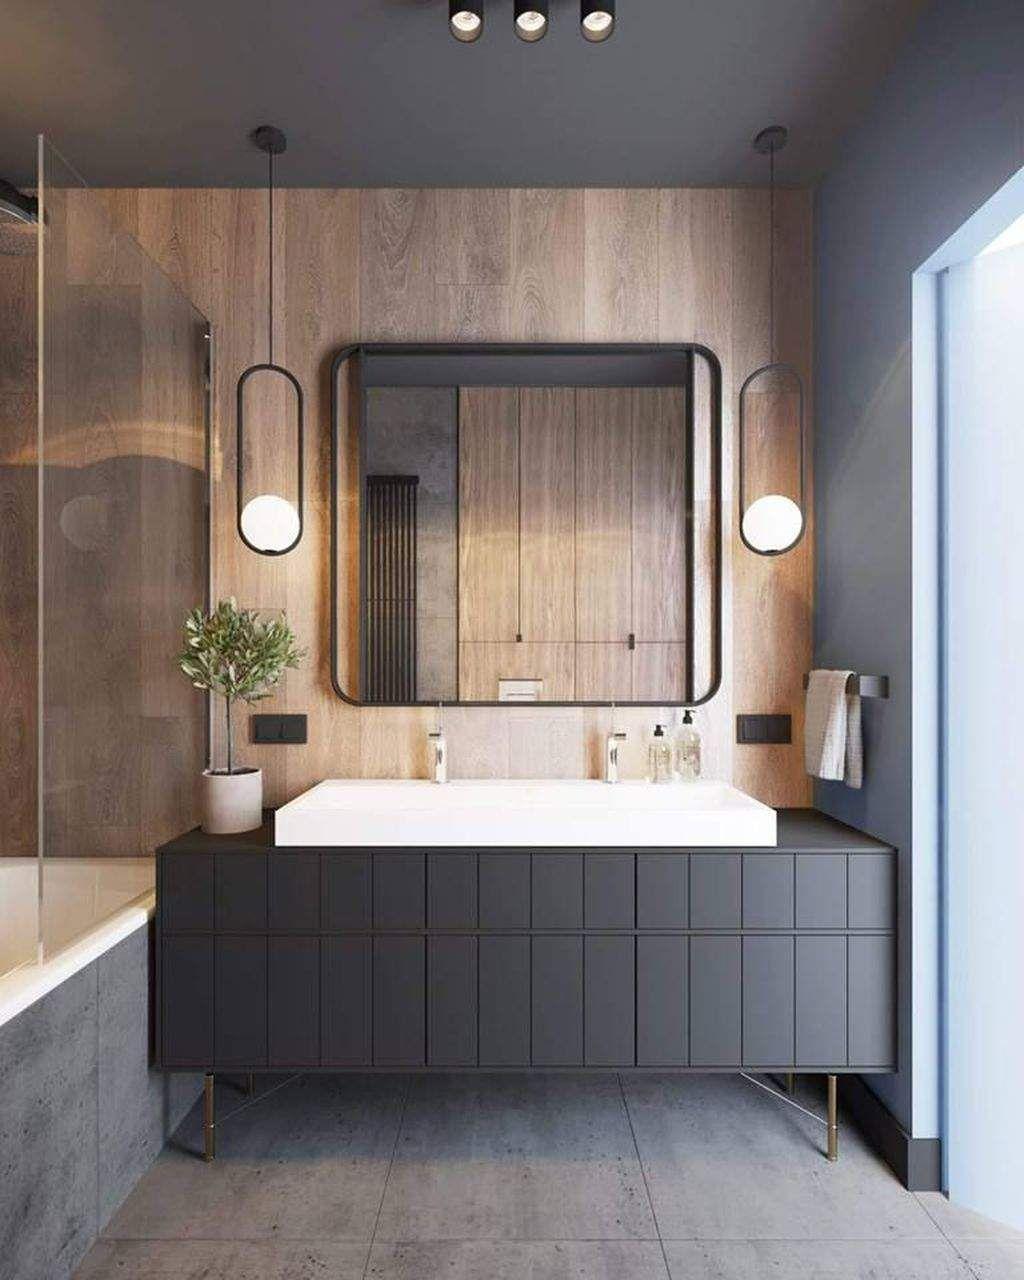 43 Mirror Decoration You Will Love Mirror Decoration You Will Love In Interior Design Modern Bathroom Mirrors Modern Bathroom Design Bathroom Mirror Design